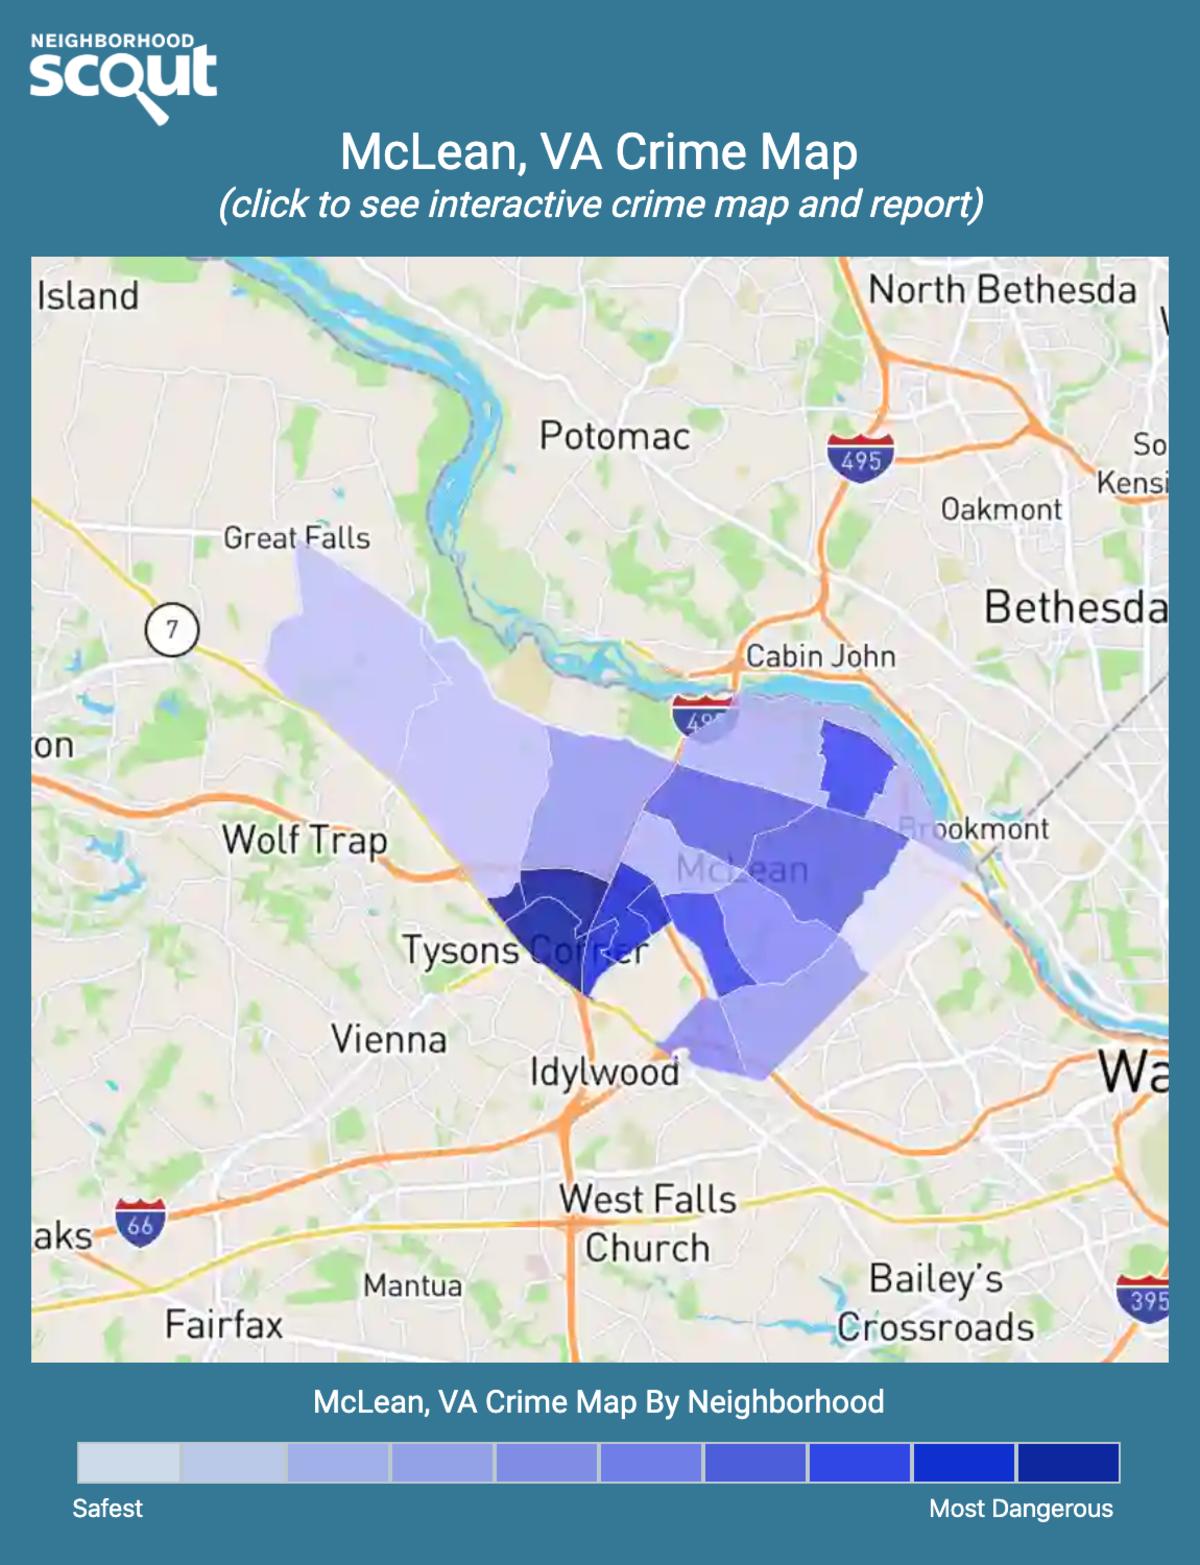 McLean, Virginia crime map